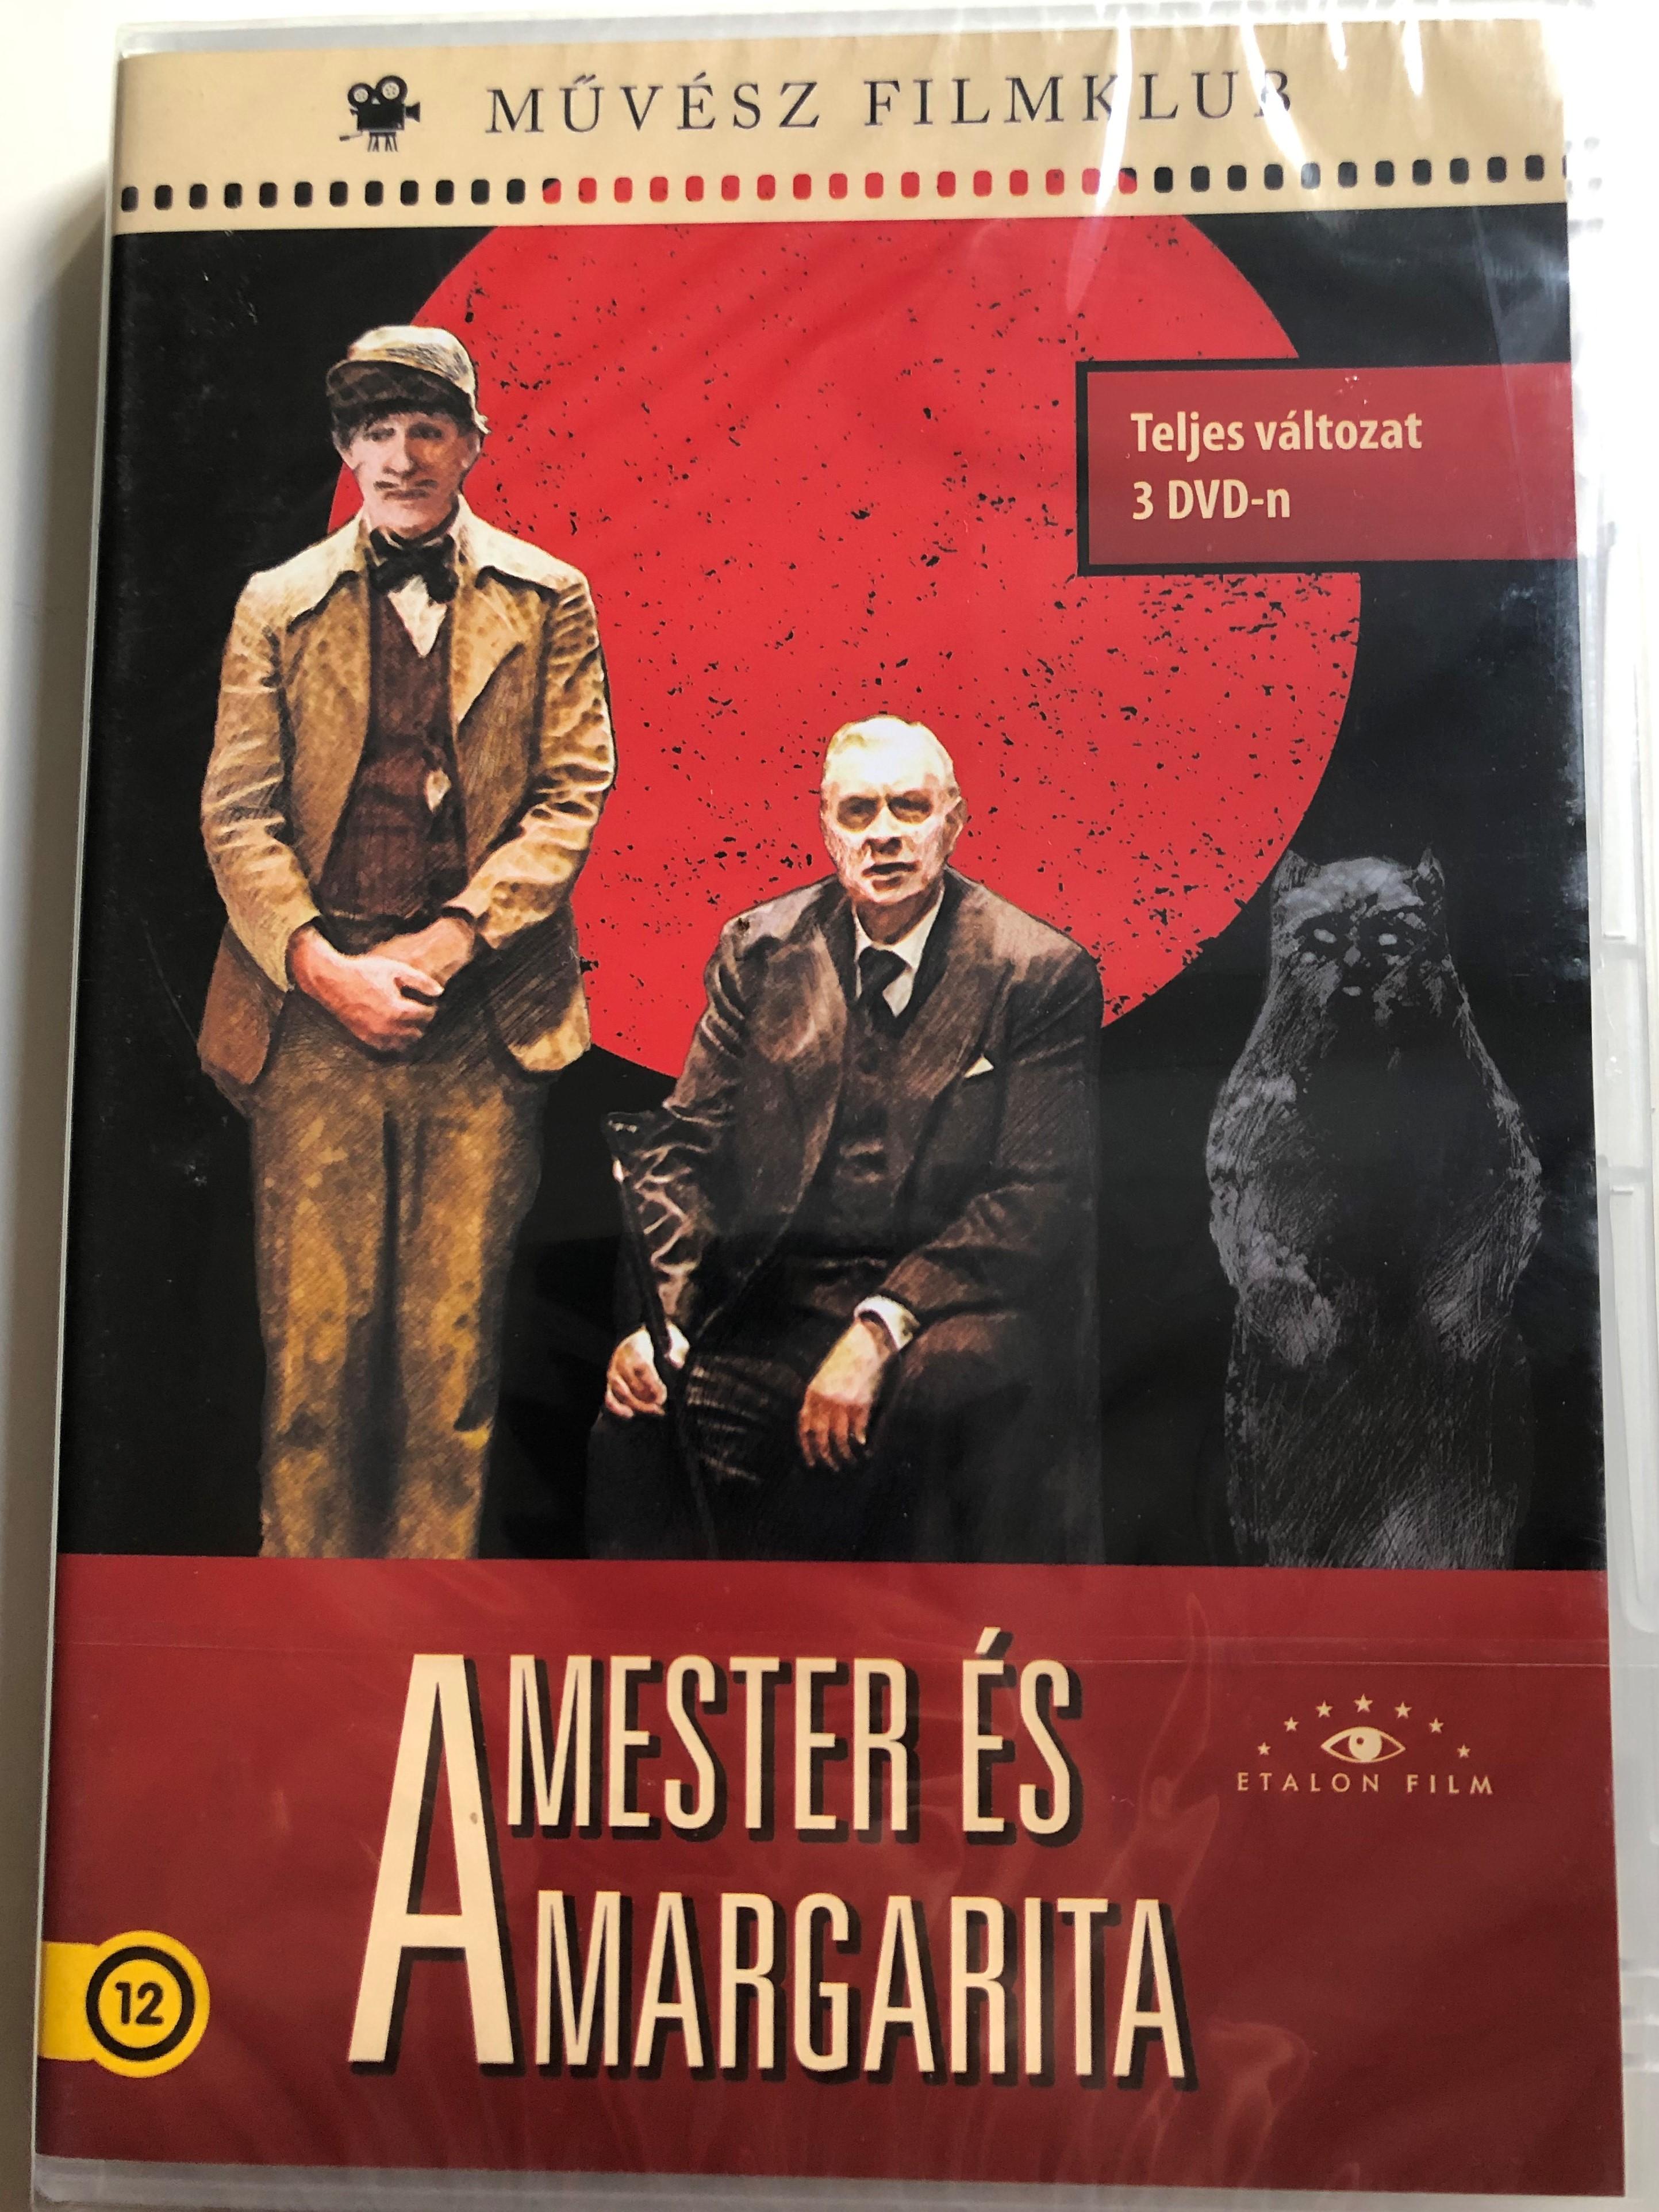 master-i-margarita-dvd-2005-a-mester-s-margarita-directed-by-vladimir-bortko-1.jpg